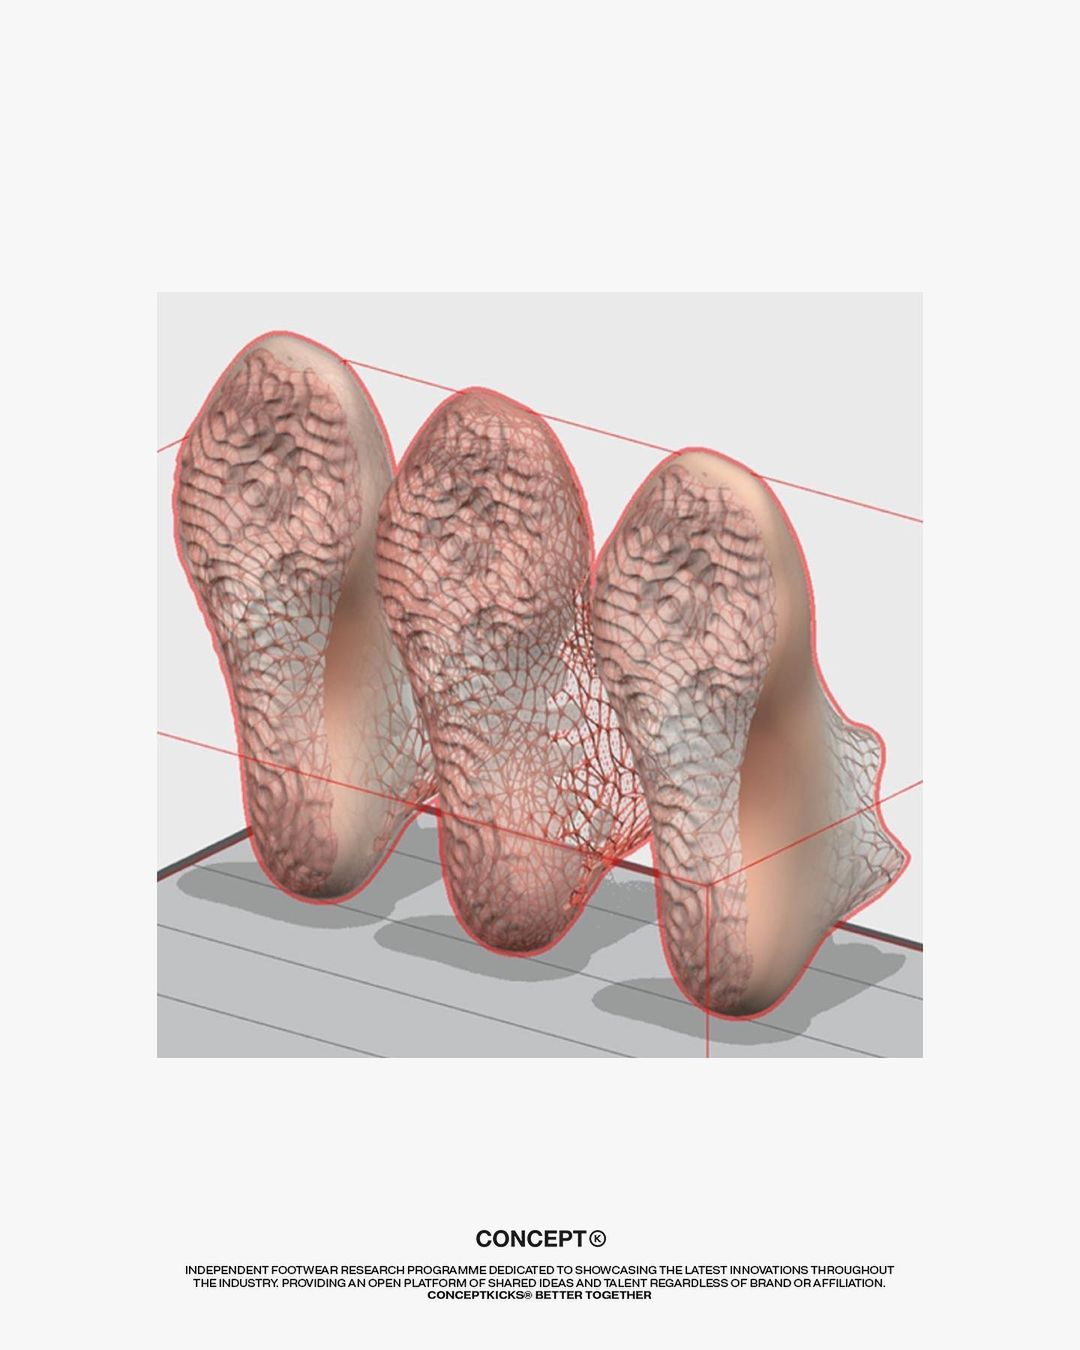 SCCCCCRY,曝光,3D 打印  3D 打印的最怪球鞋又来了!这设计理念真是绝了!